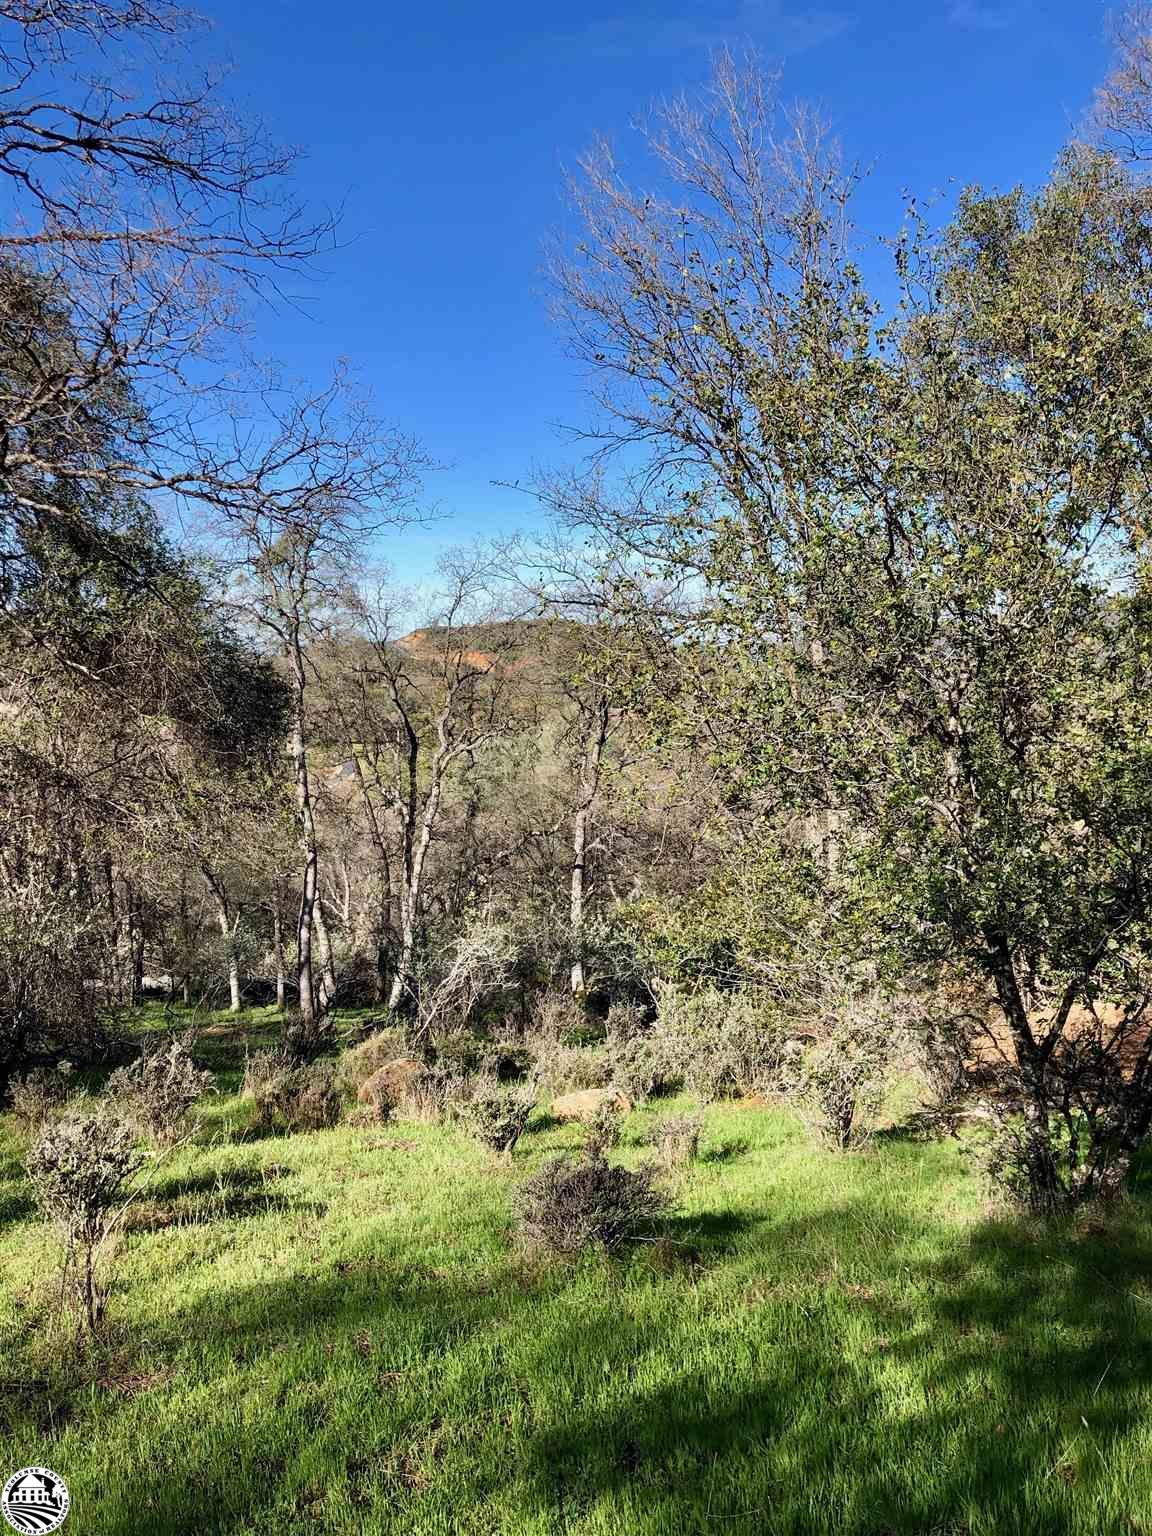 0000 Parkridge #3| Lot 125 Ave, Sonora, CA, 95370